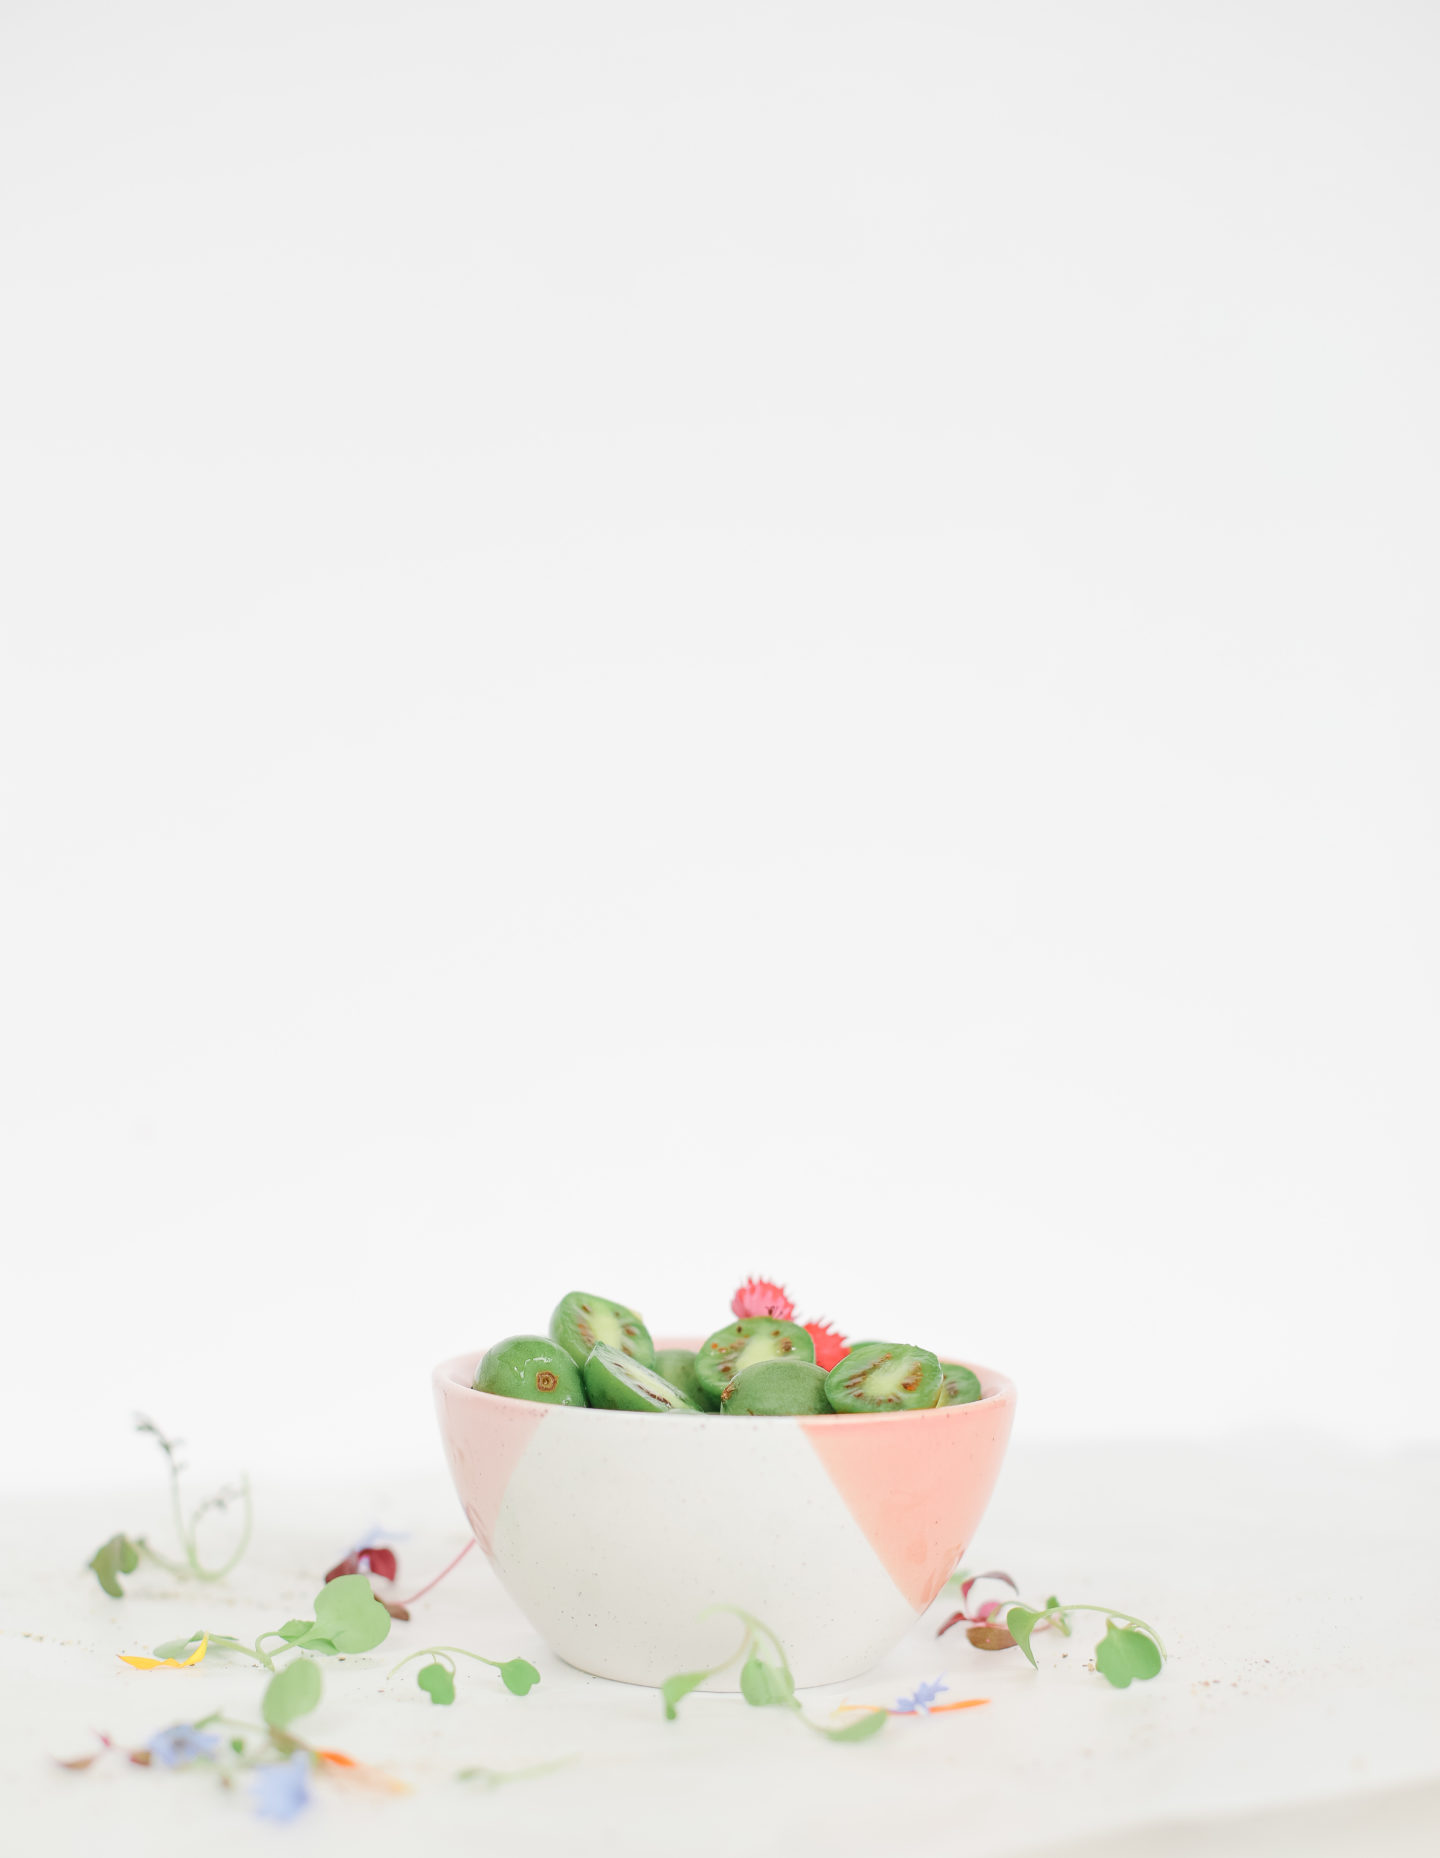 Mini Kiwi Poke bowls